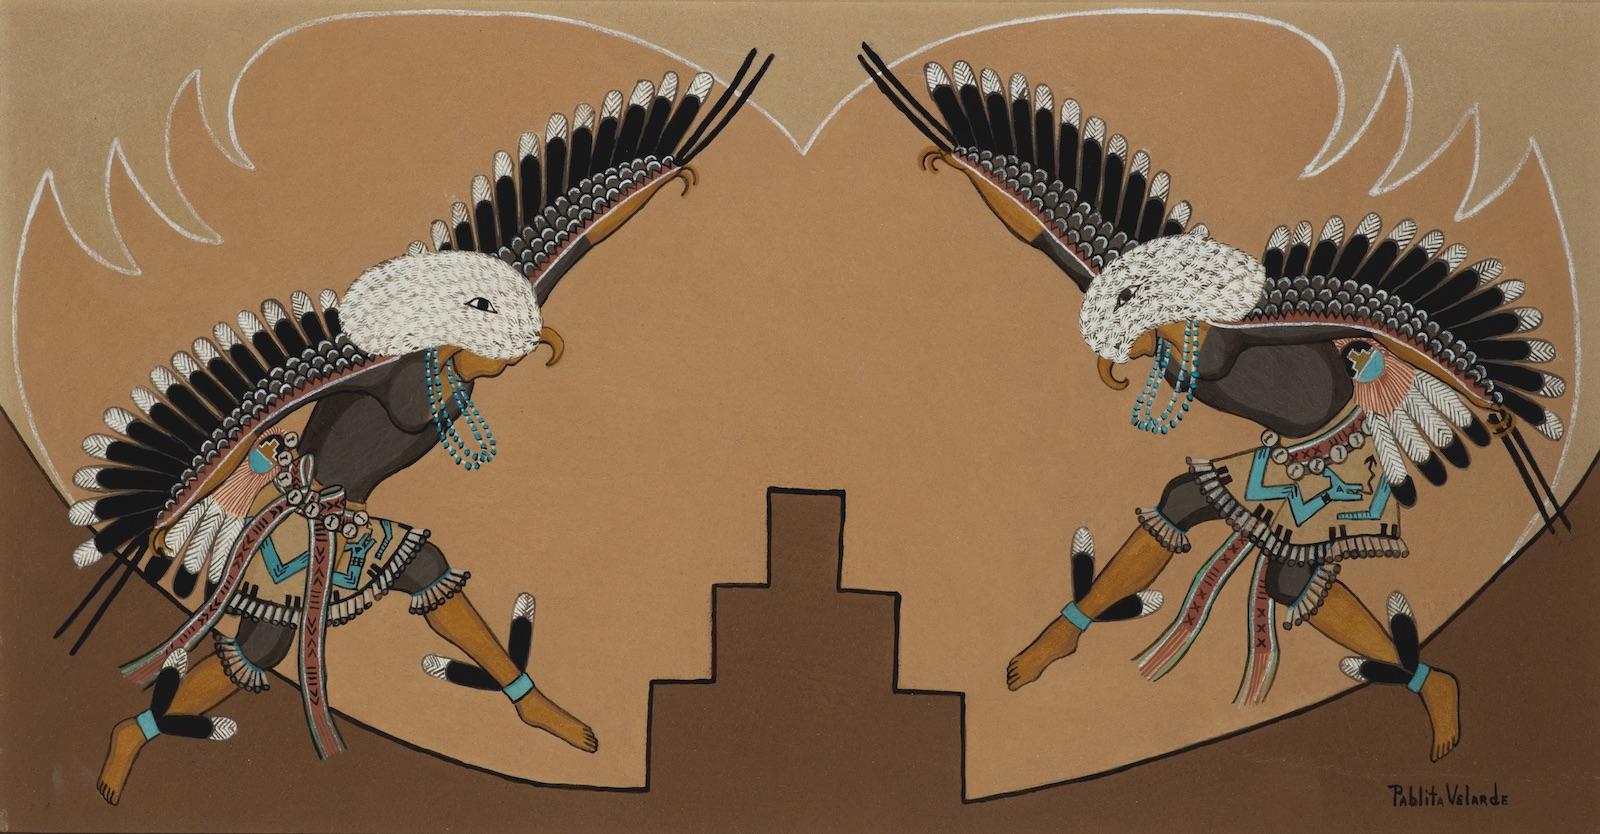 Pablita Velarde, Santa Clara Pueblo Eagle Dancers